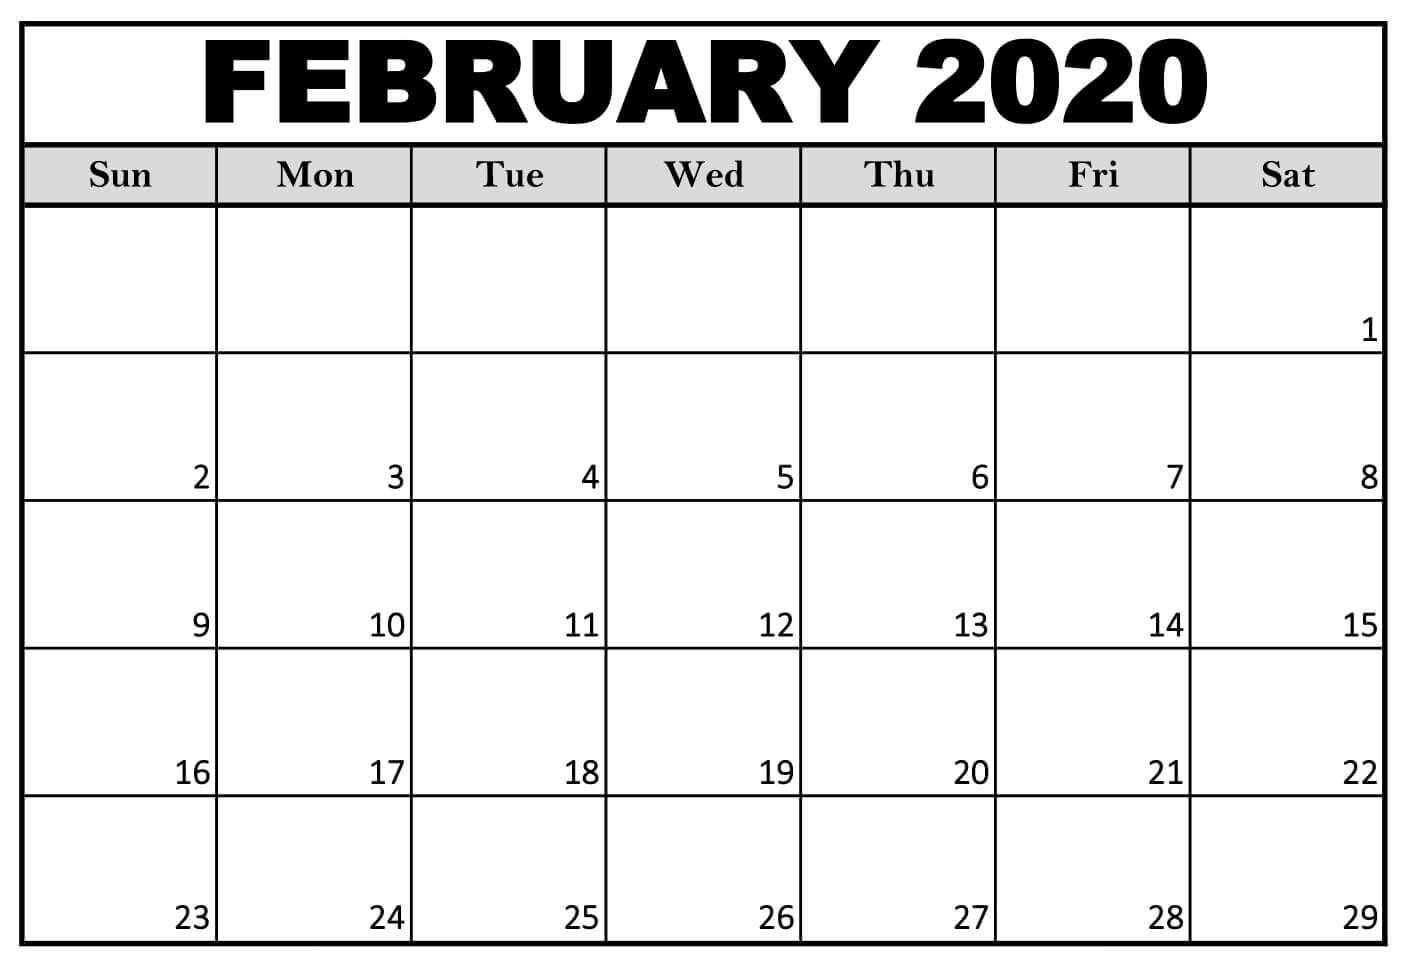 Blank February 2020 Calendar Free Printable - 2019 Calendars